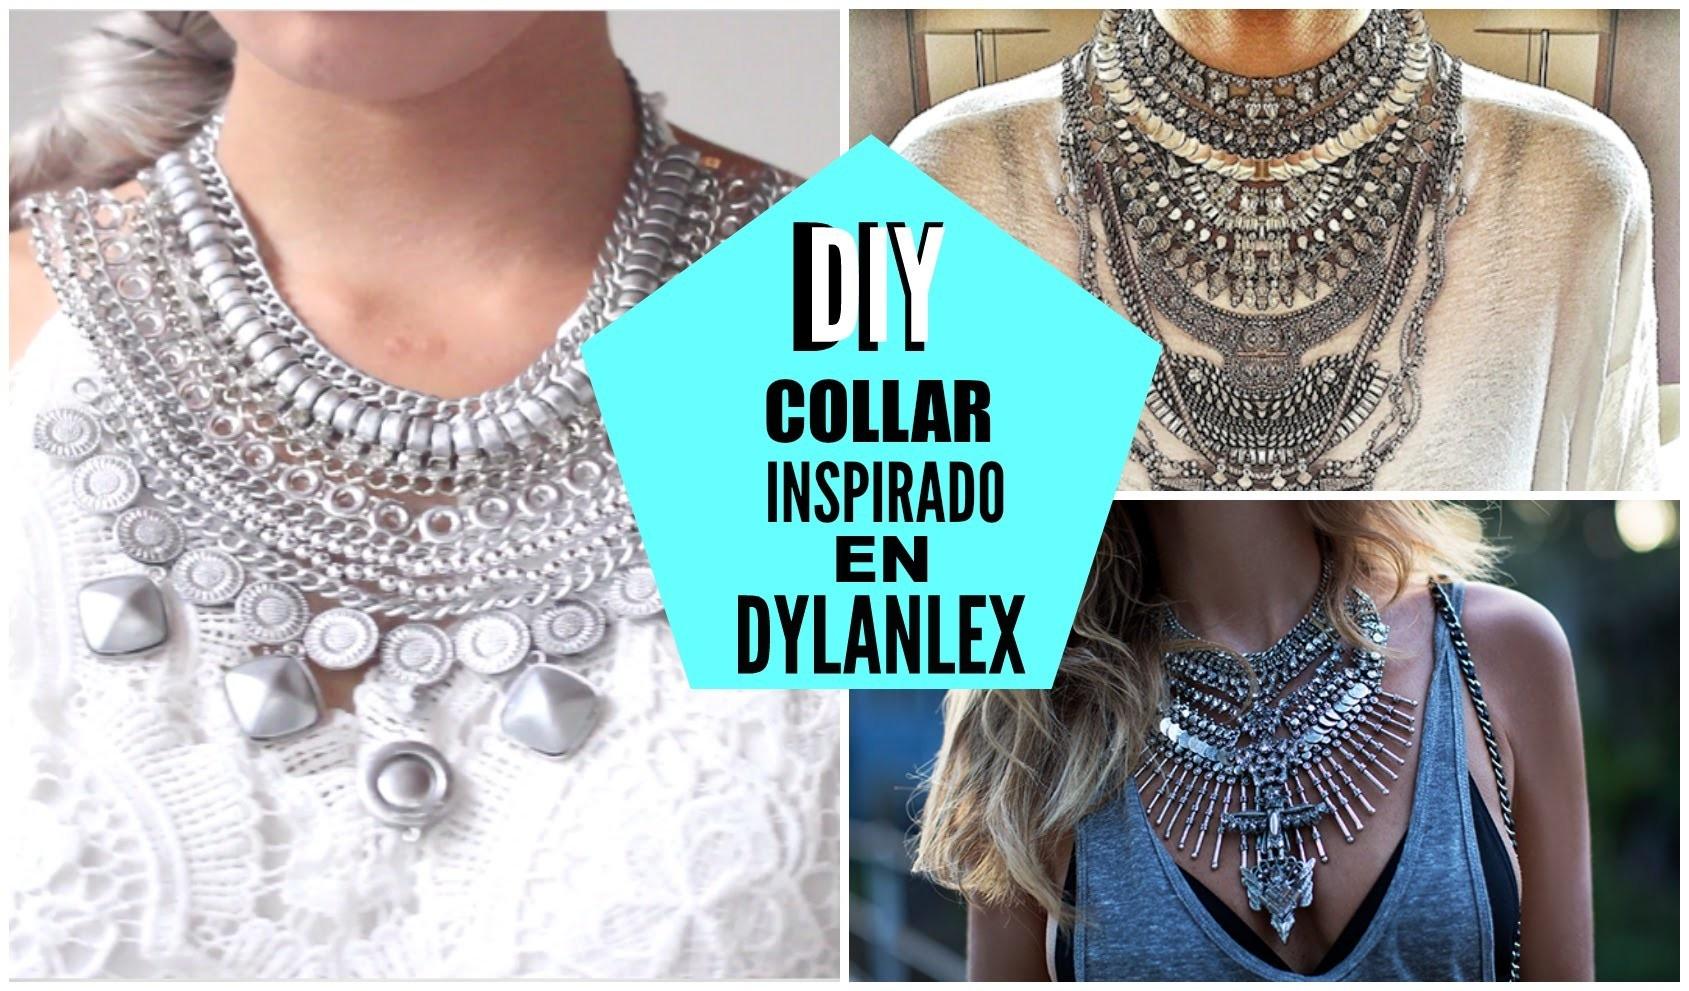 DIY maxi collar inspirado en Dylanlex